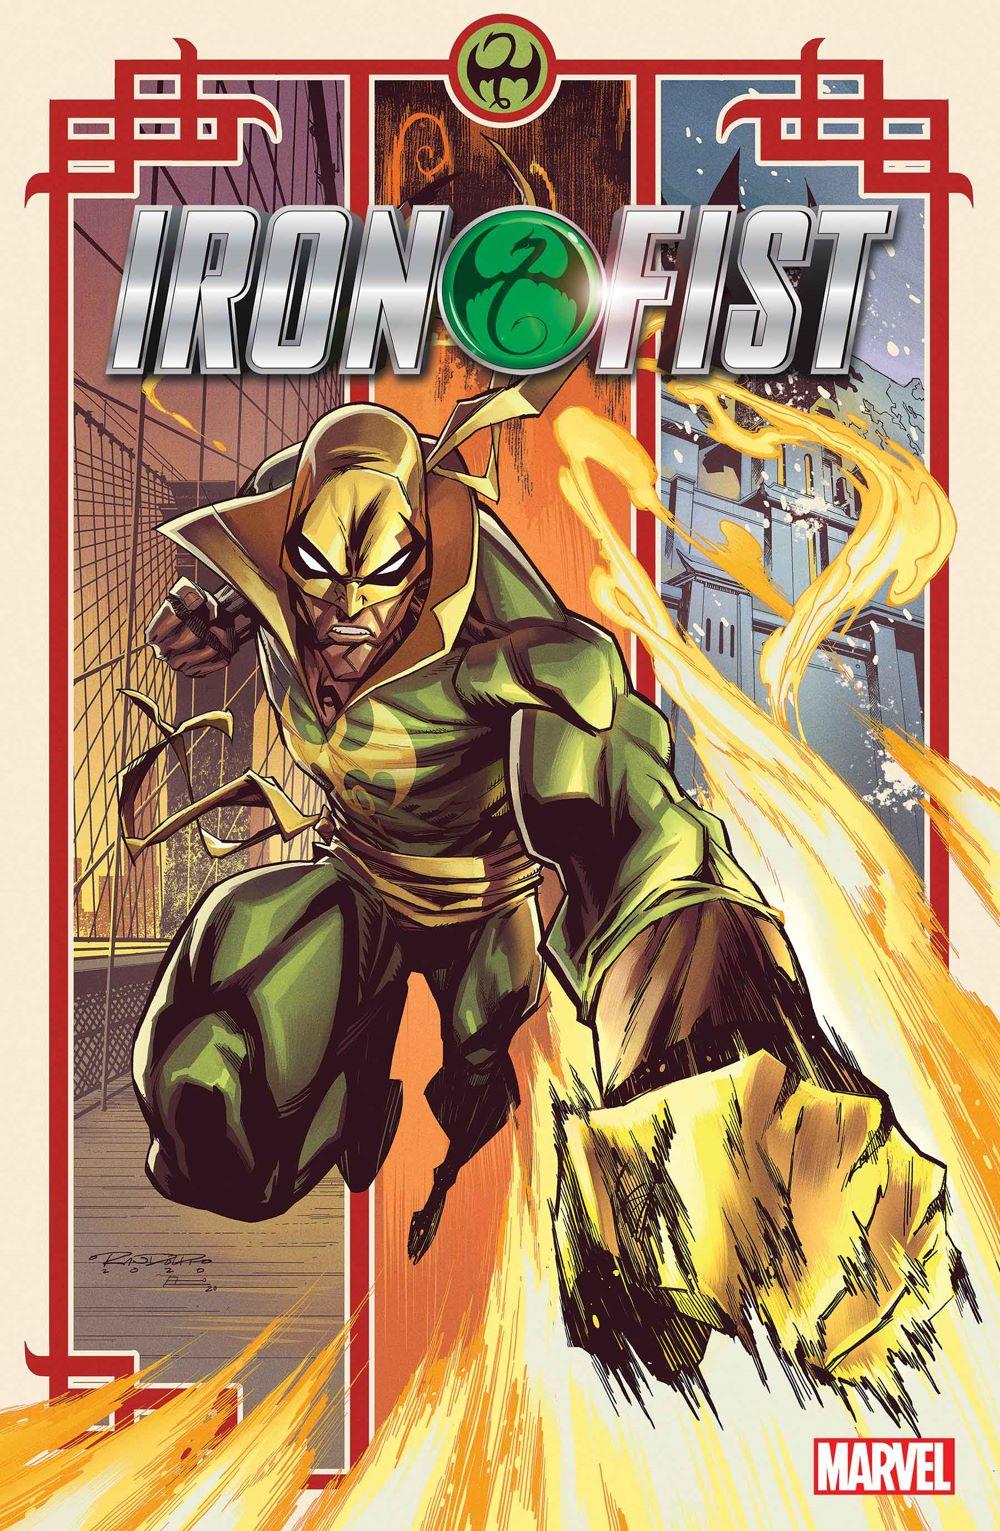 IRONFISTHOD2021001_RandolphVar Marvel Comics January 2021 Solicitations